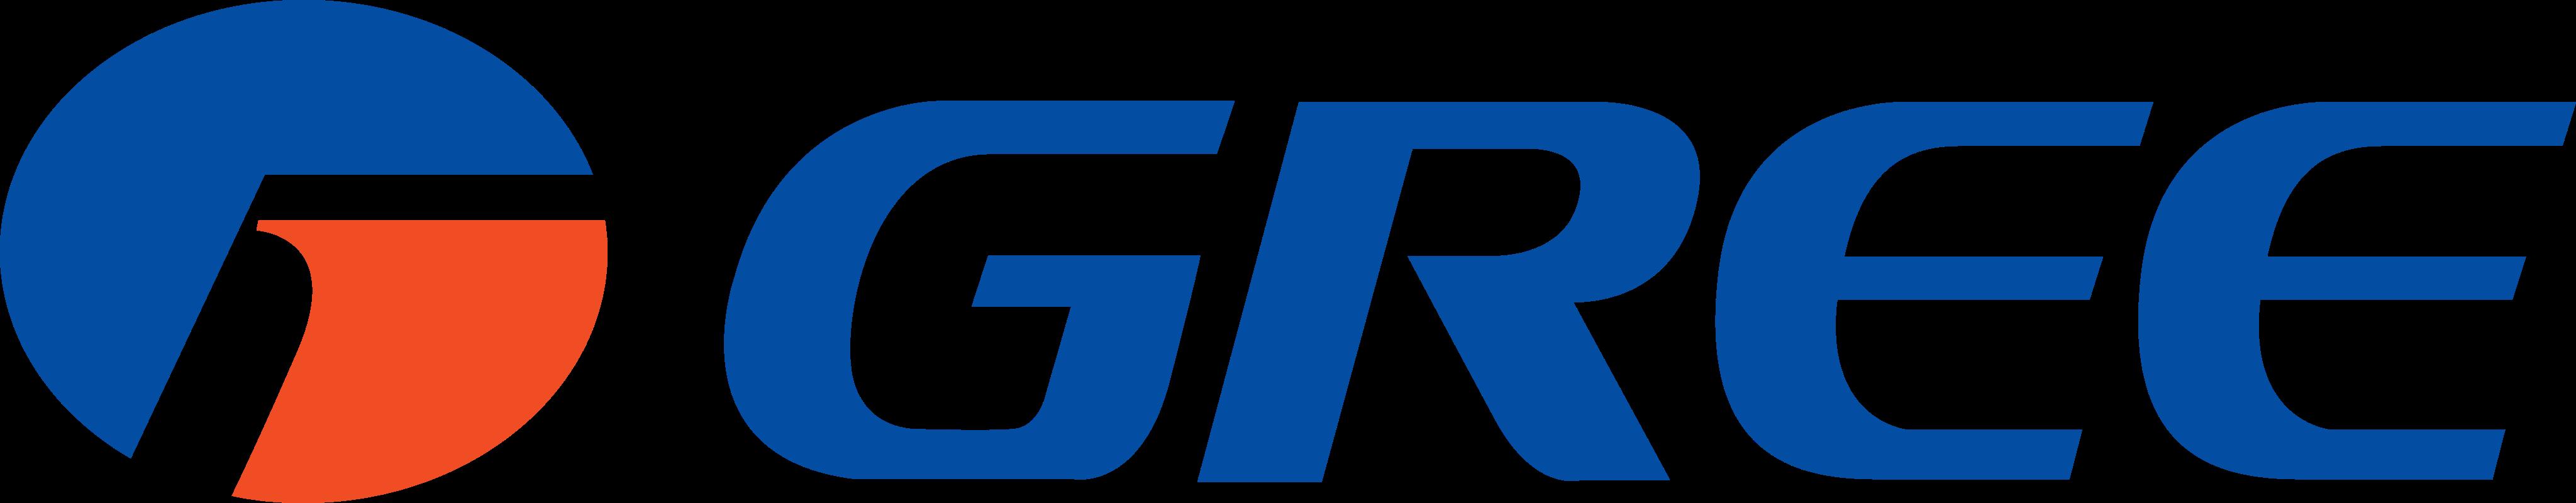 Gree Logo.